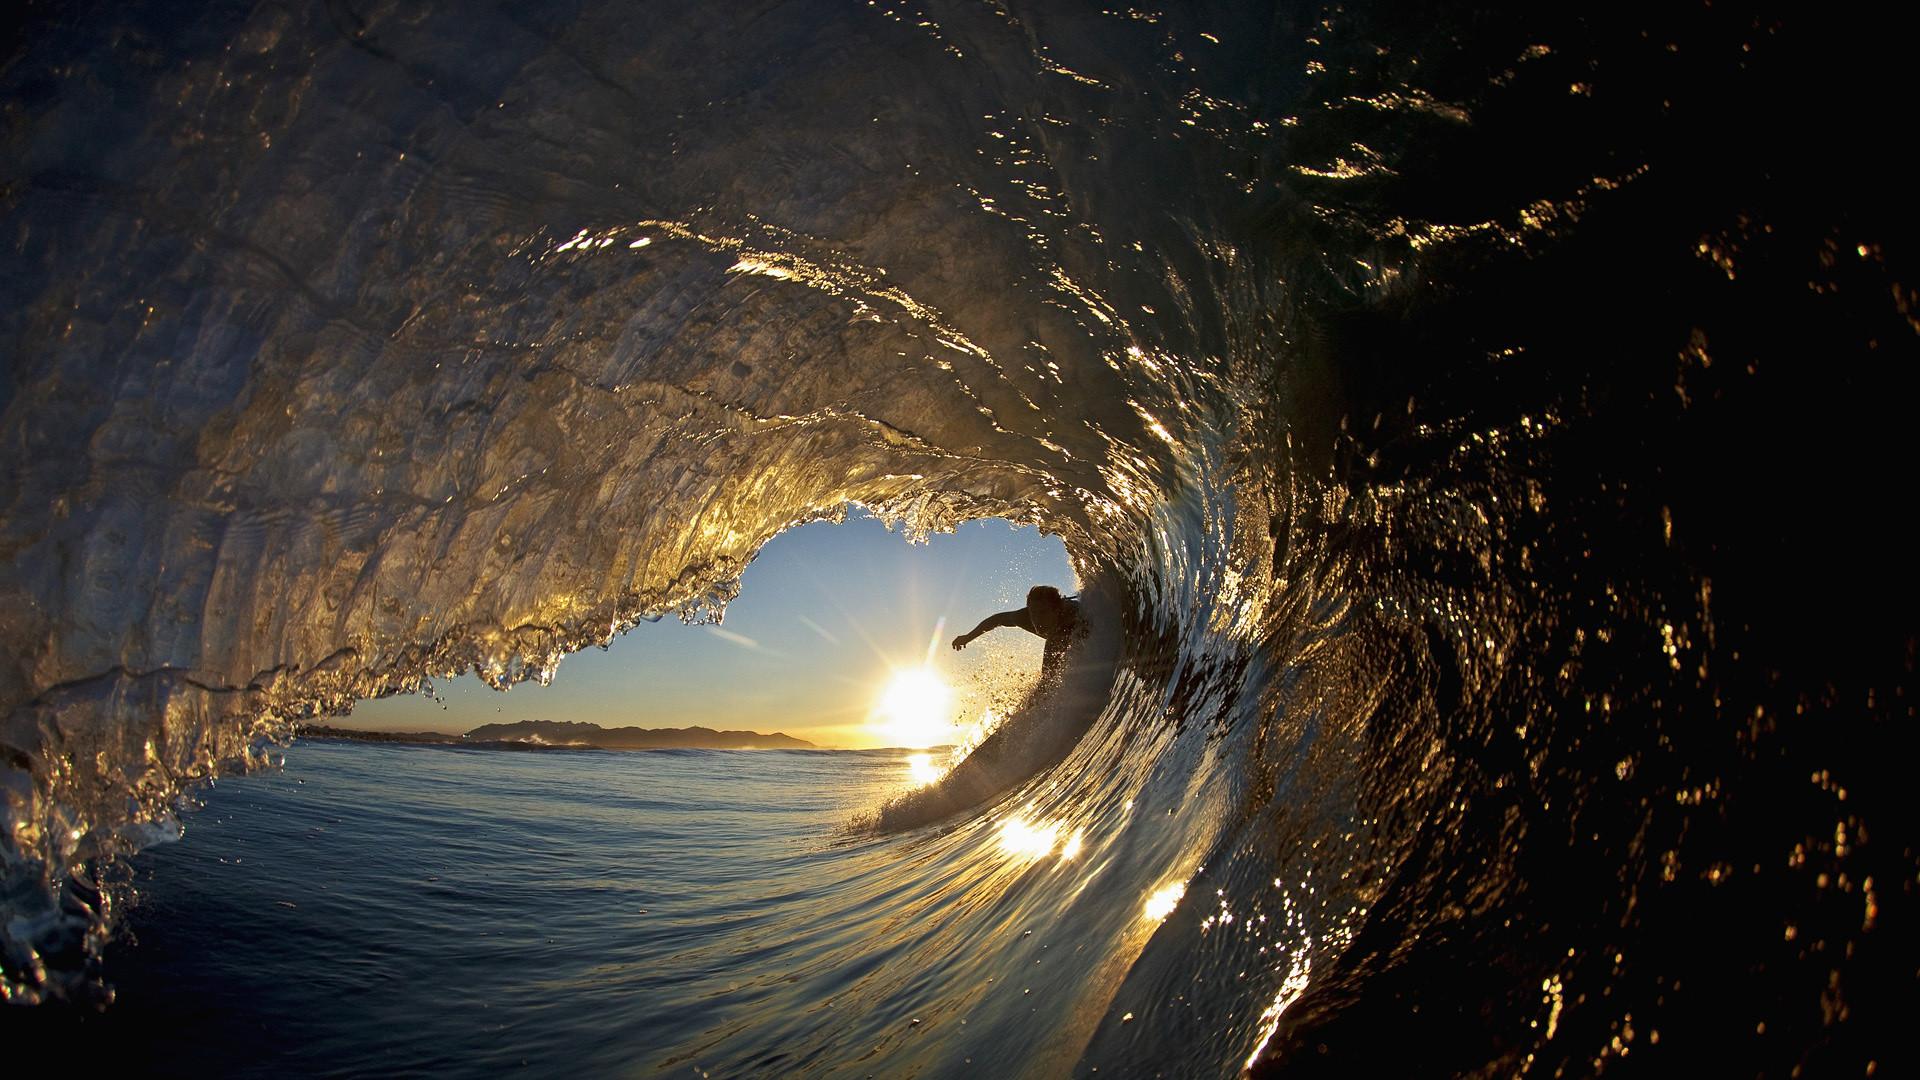 Surfing Wallpaper 5495